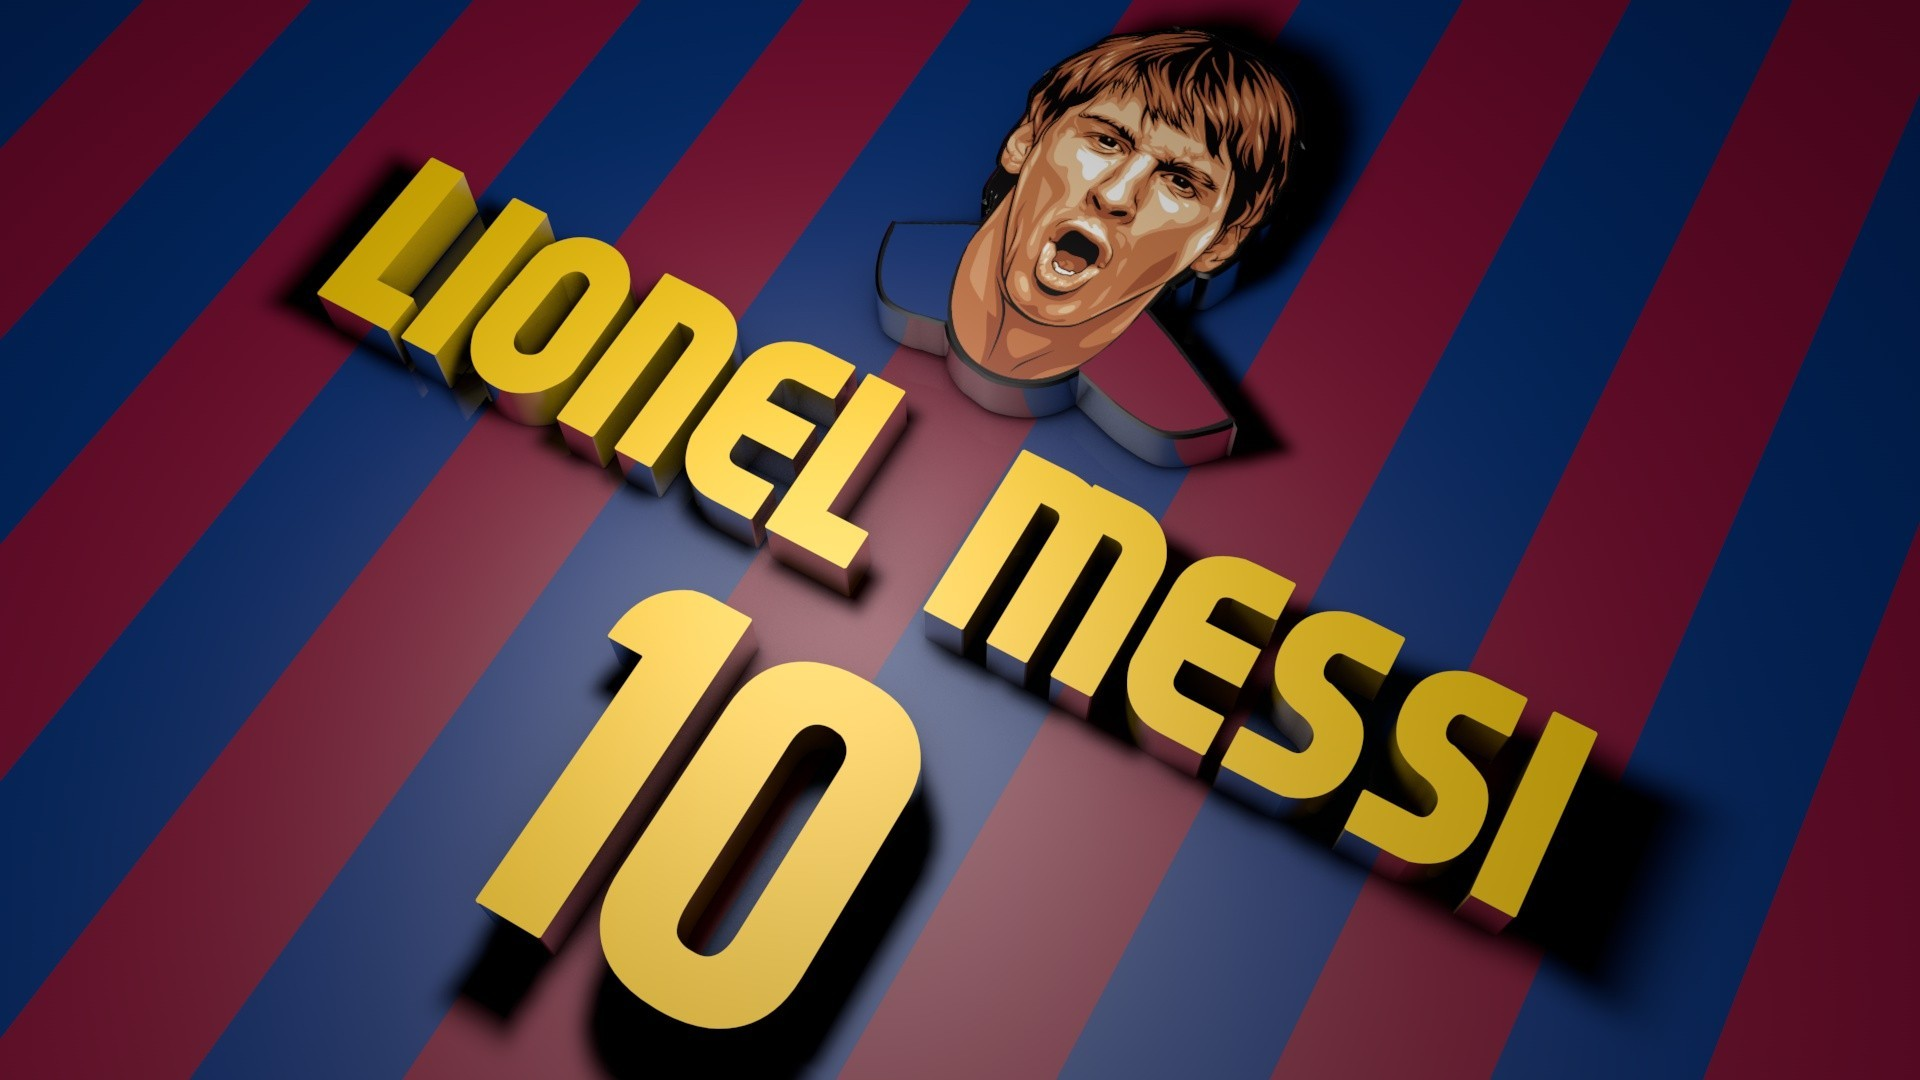 Messi Wallpaper 10